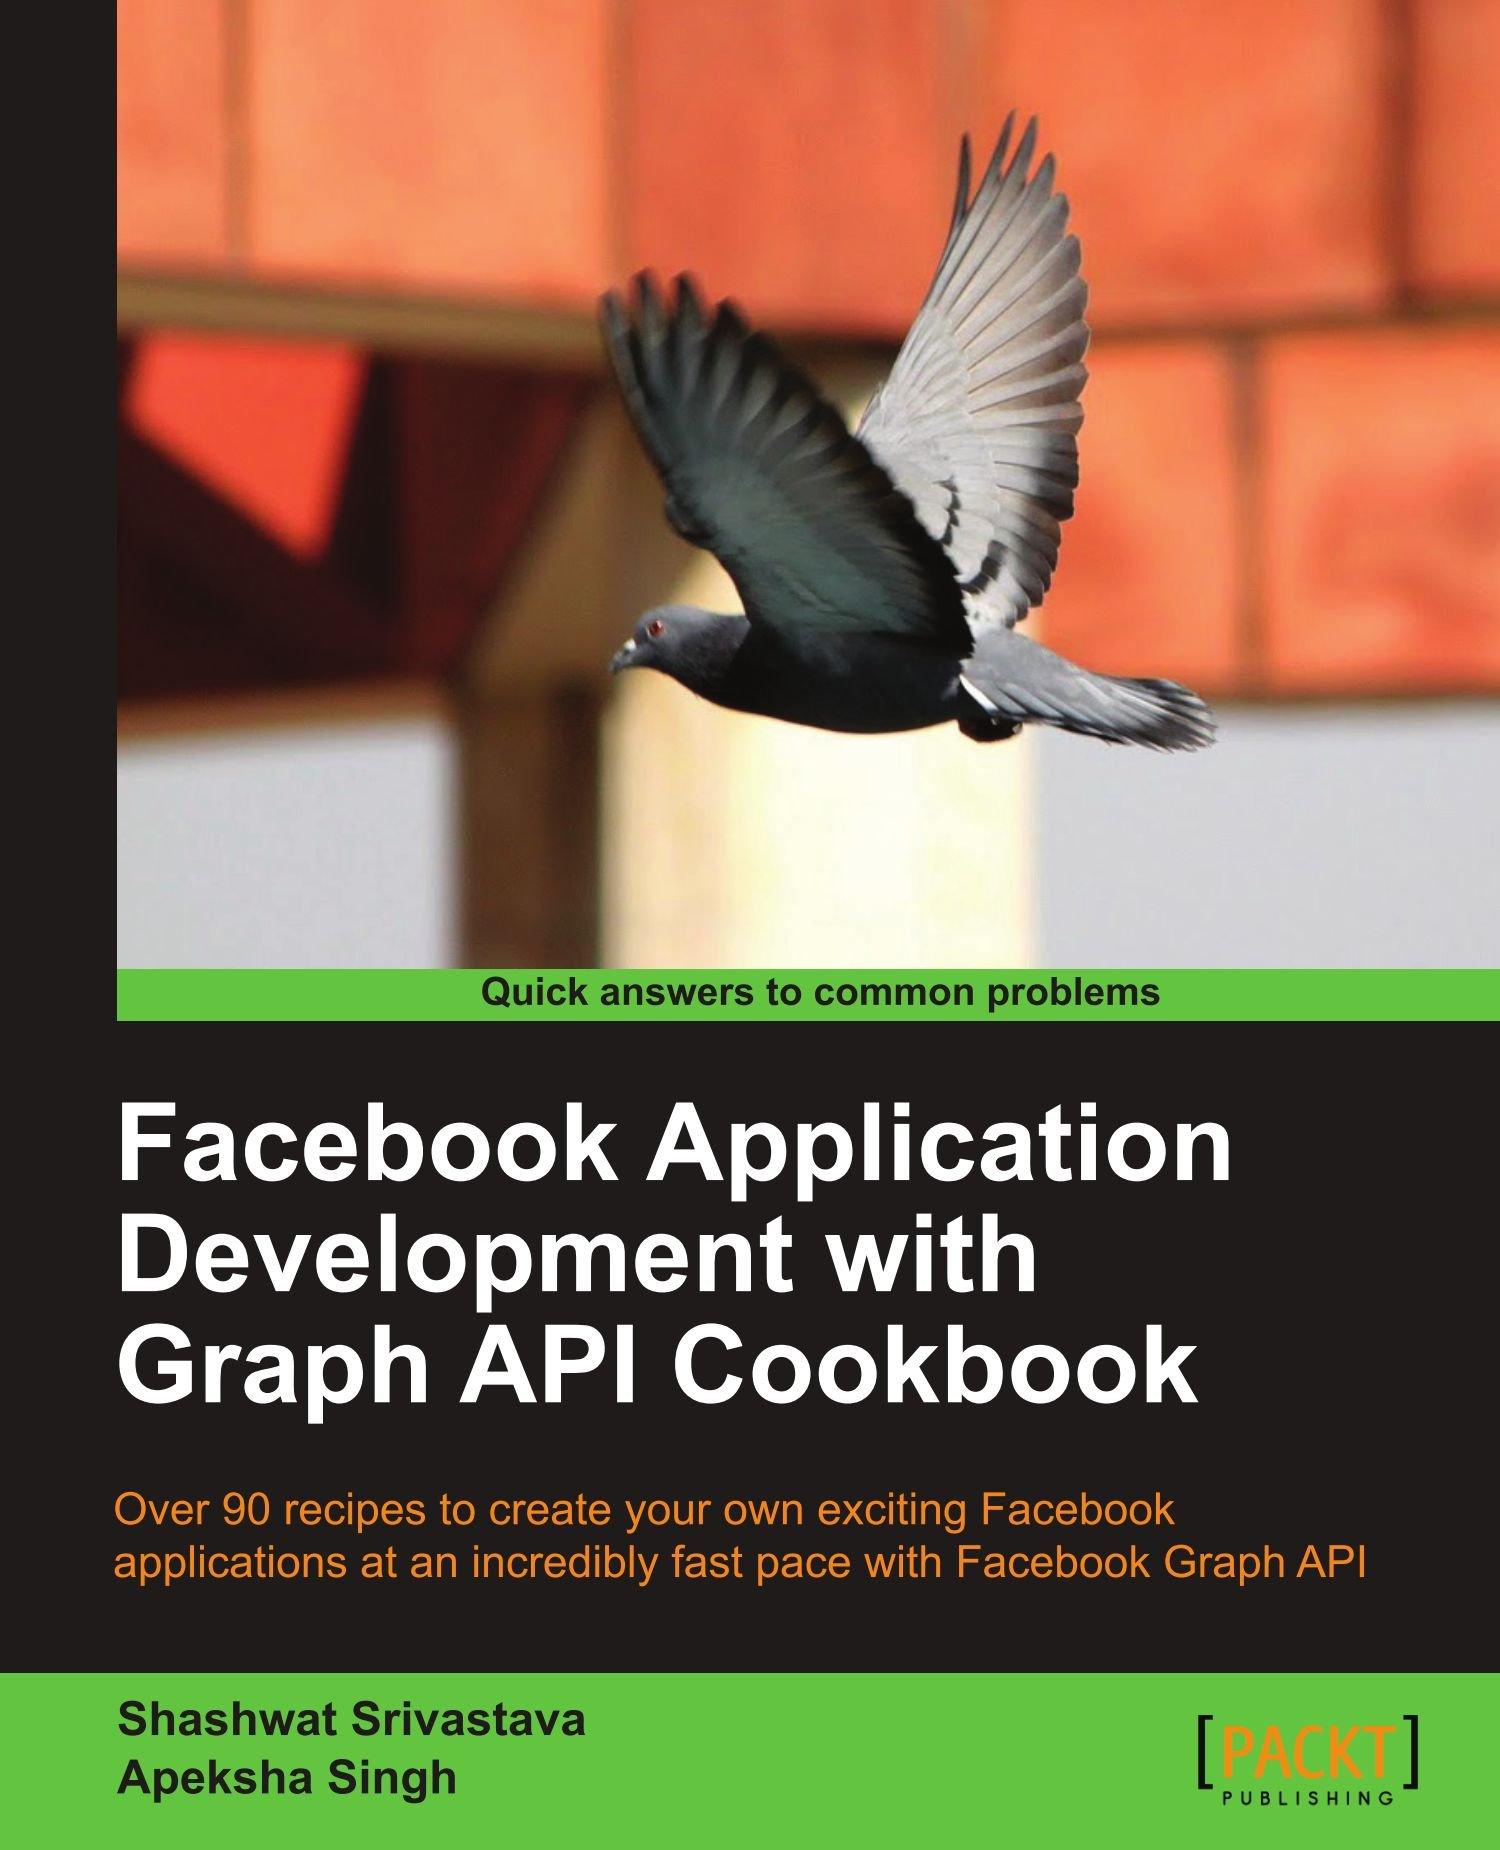 Facebook Application Development with Graph API Cookbook PDF